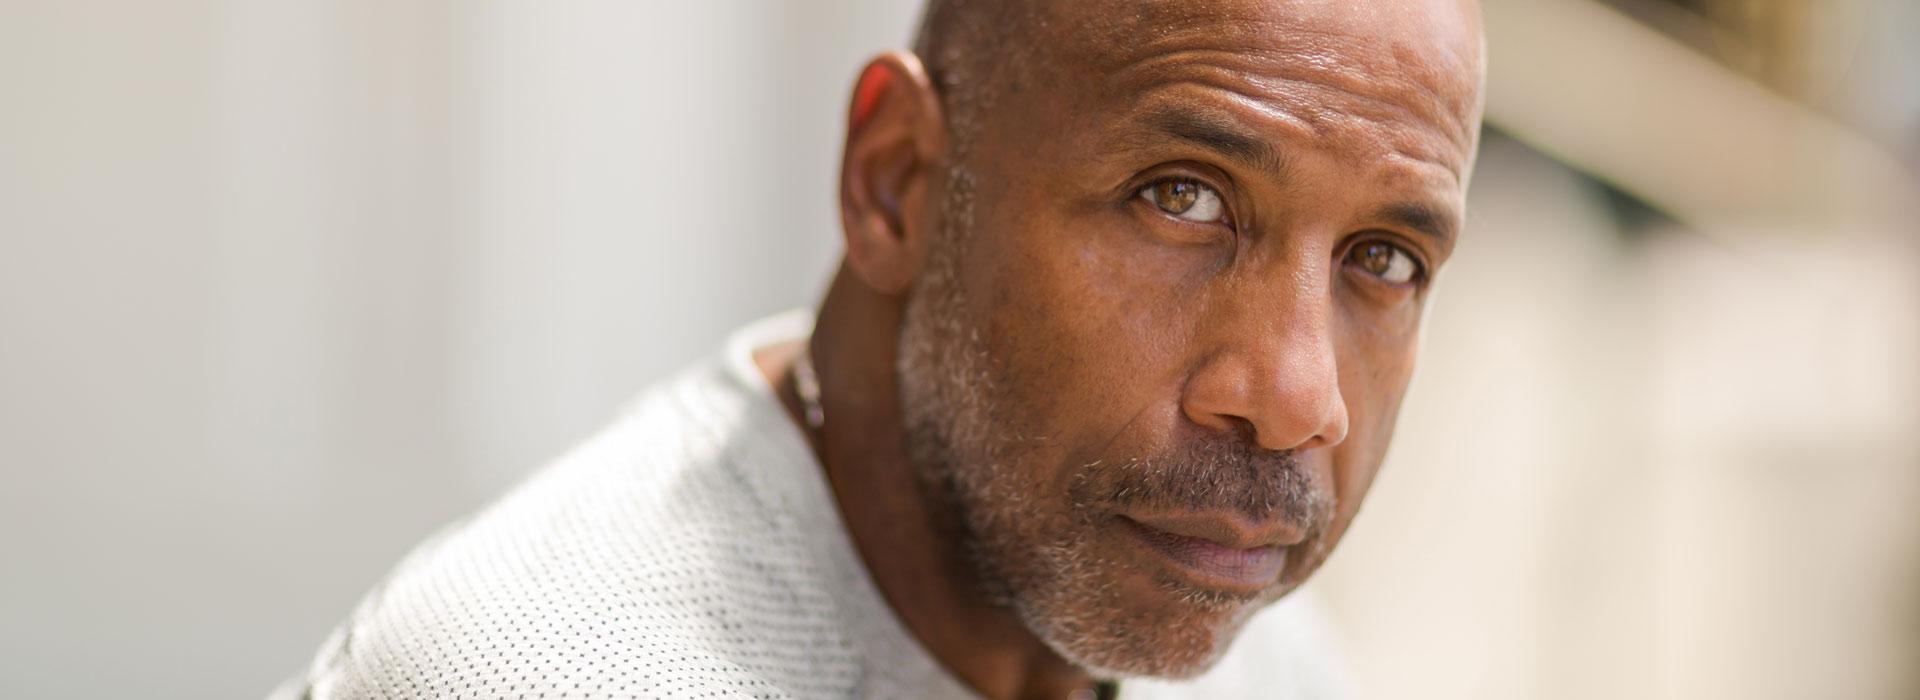 trauma-ptsd-affects-african-american-men